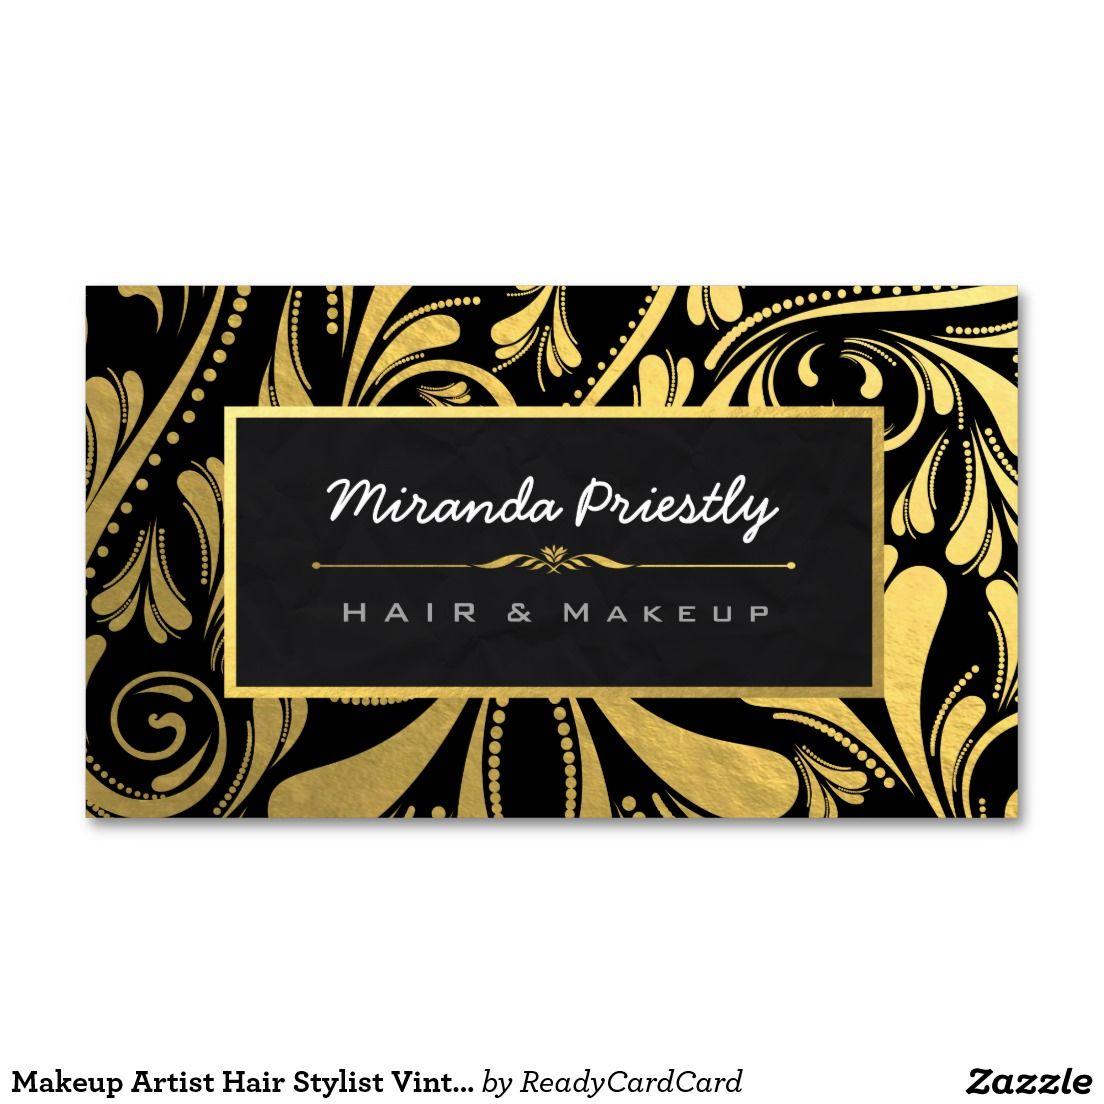 Makeup Artist Hair Stylist Vintage Black & Gold Business Card ...